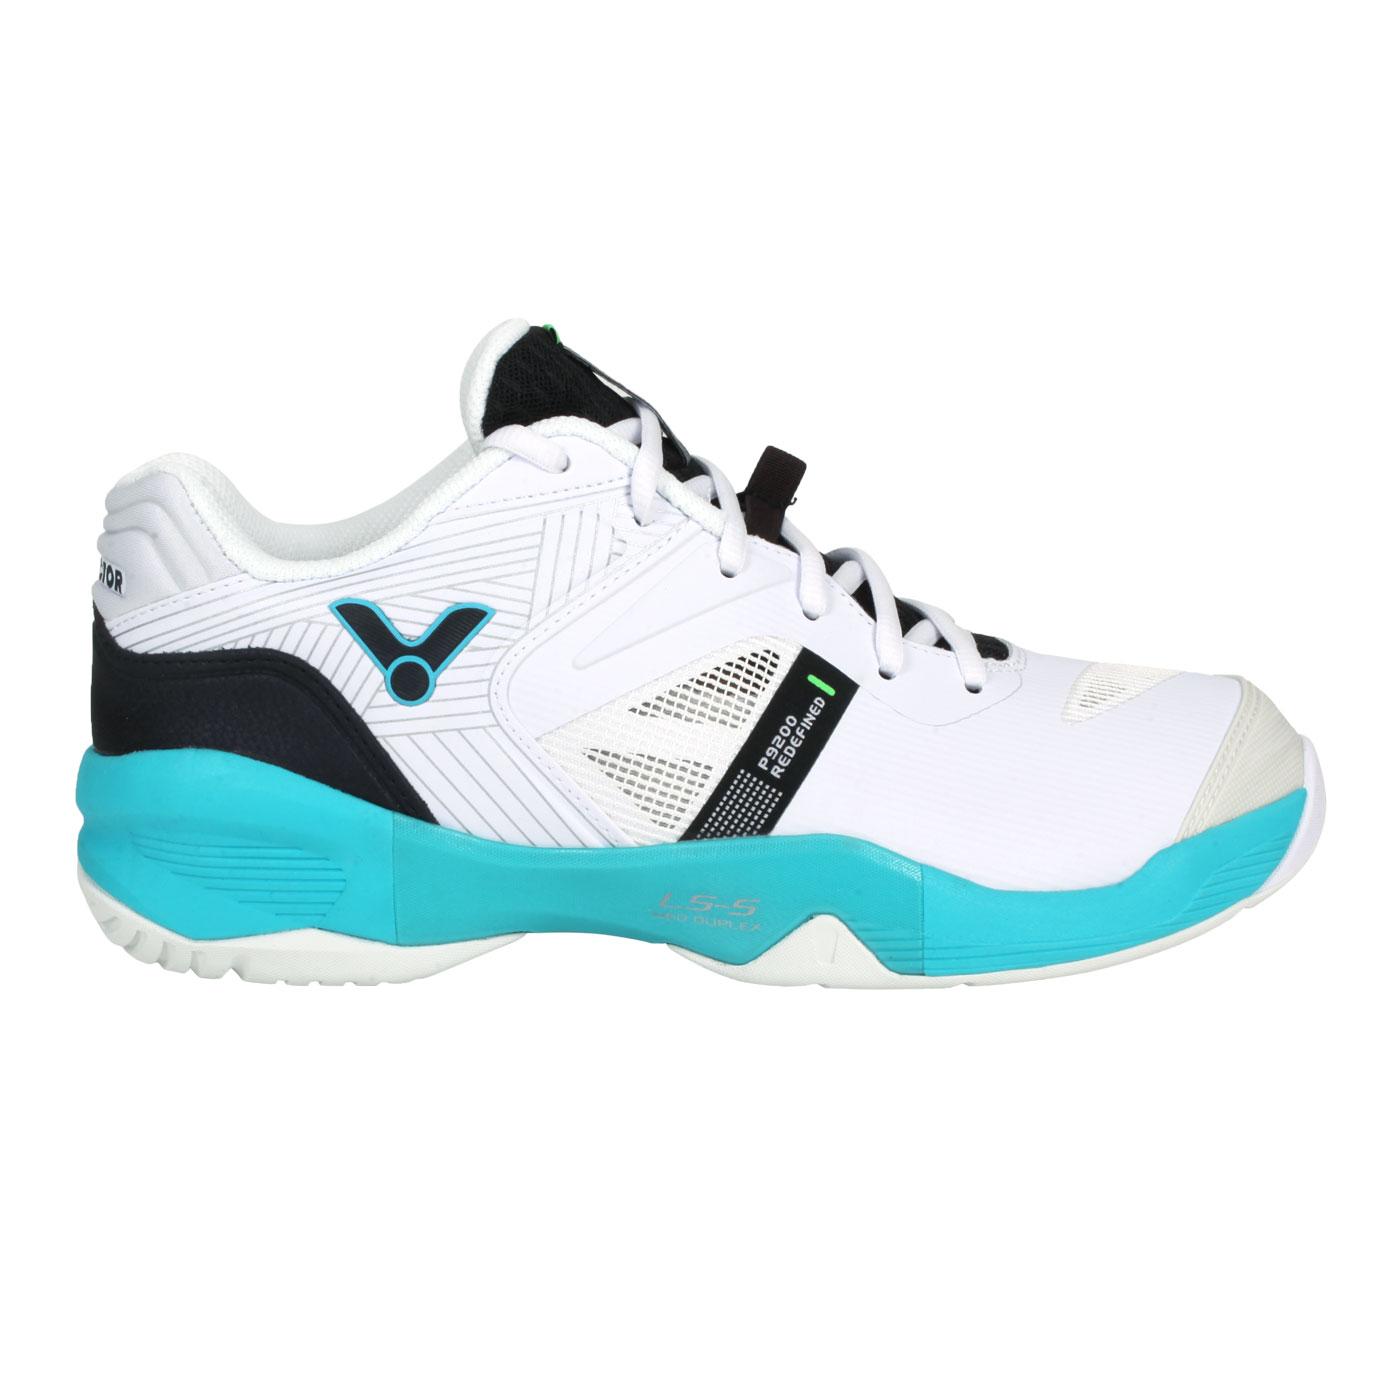 VICTOR 男款羽球鞋 P9200II-AU - 白黑藍綠